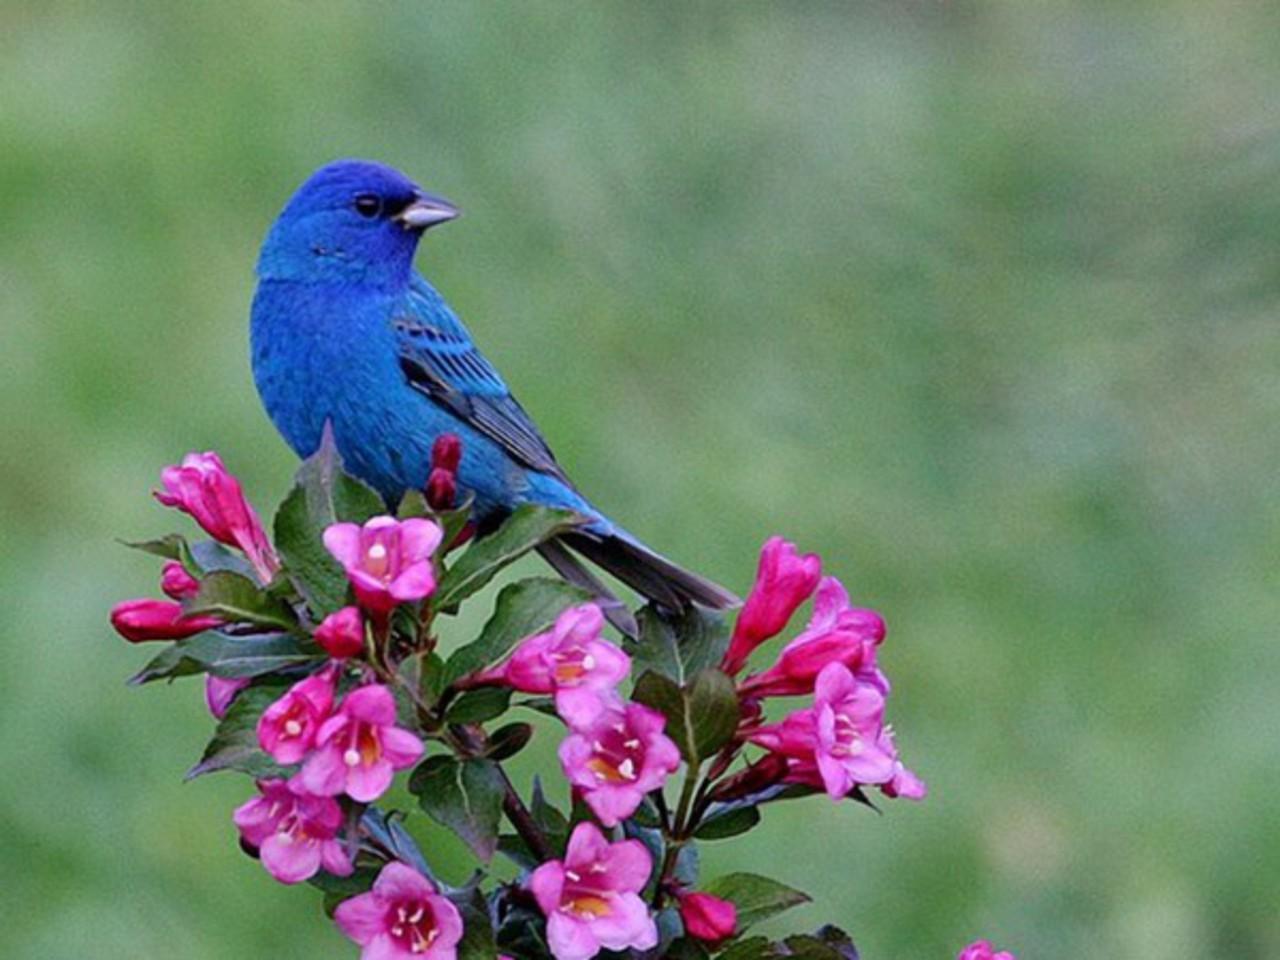 Spring Bird Beautiful Wallpaper Desktop Wallpapers Gallery 1280x960